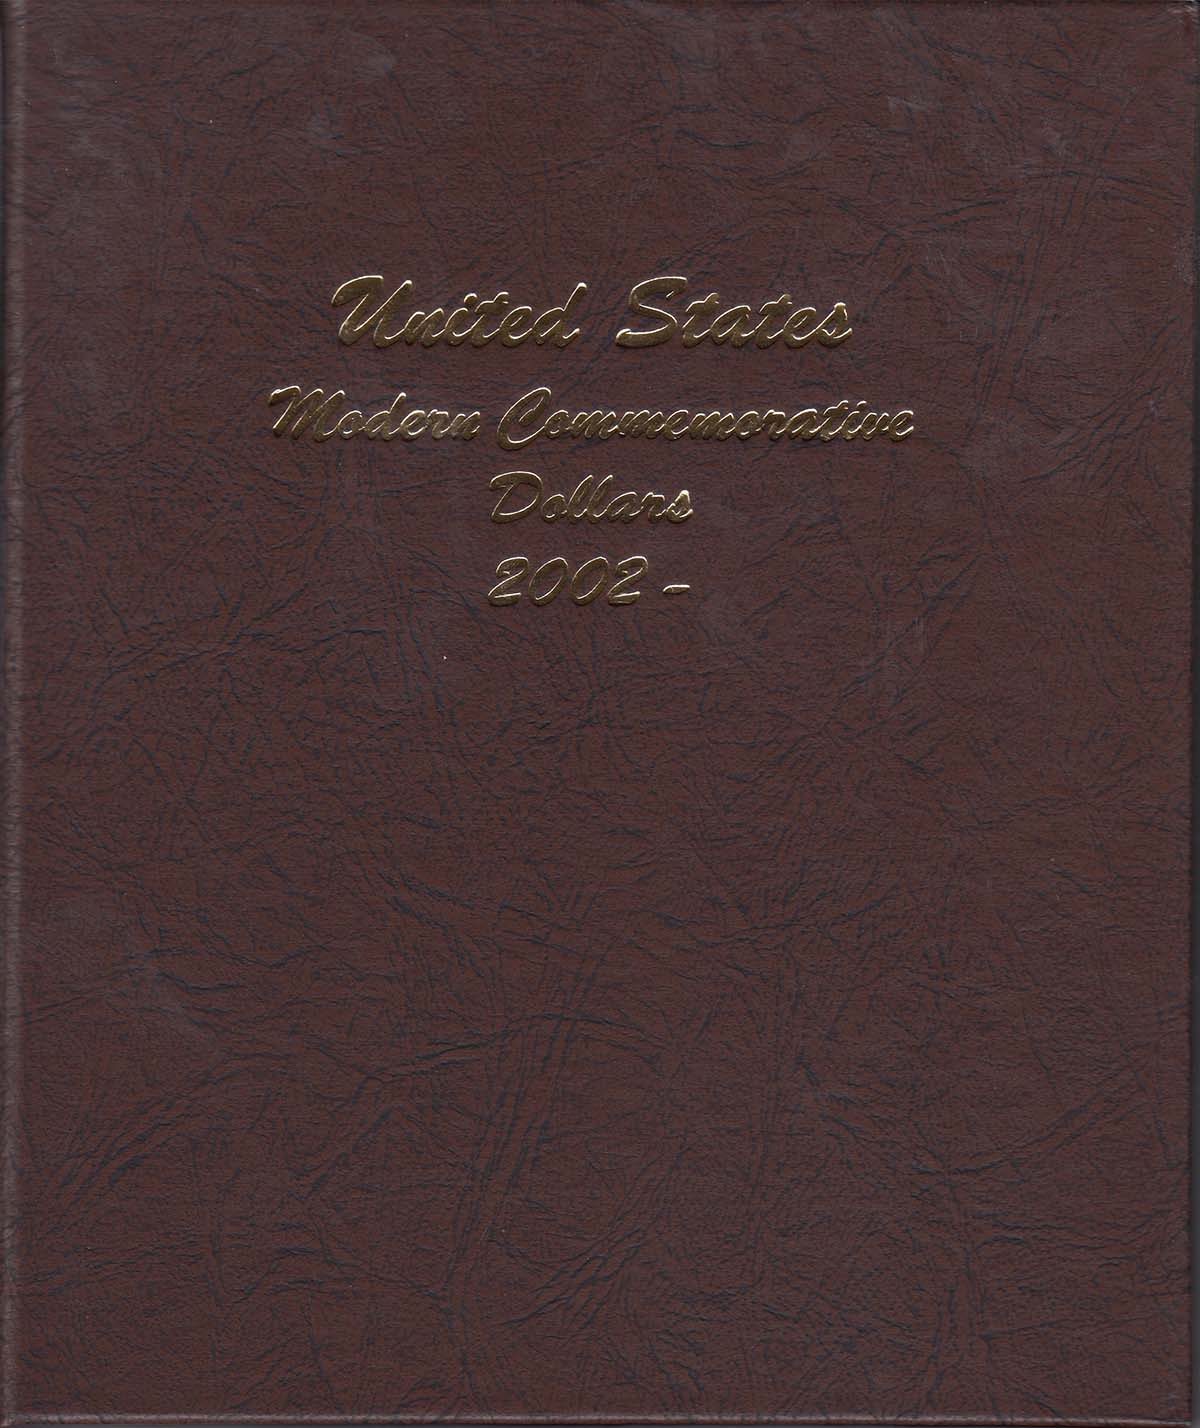 Dansco Replacement Page 1 For Album 7065 Vol 3 Modern Commemorative $ 2002-2005